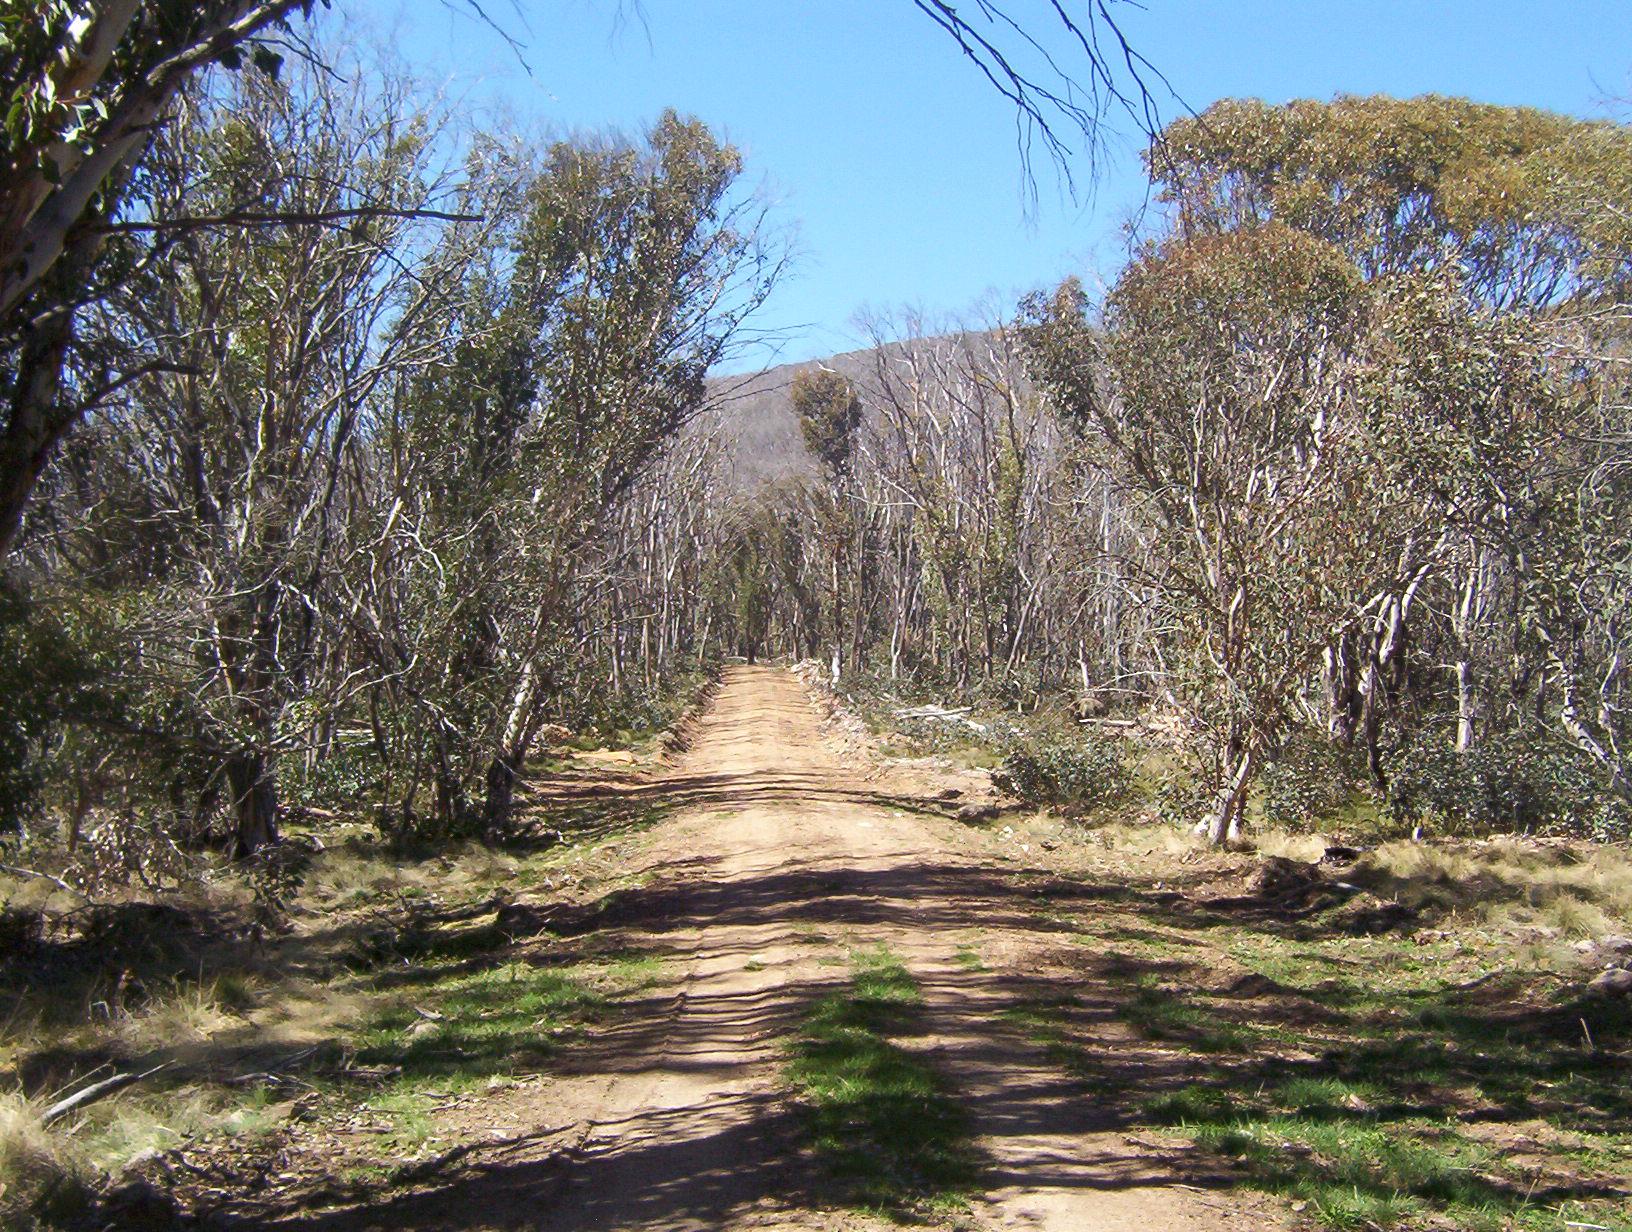 Trekking de Tasmania Australia Guía Para Caminatas Overland Puerto Track Davey Cradle Mountain Sur